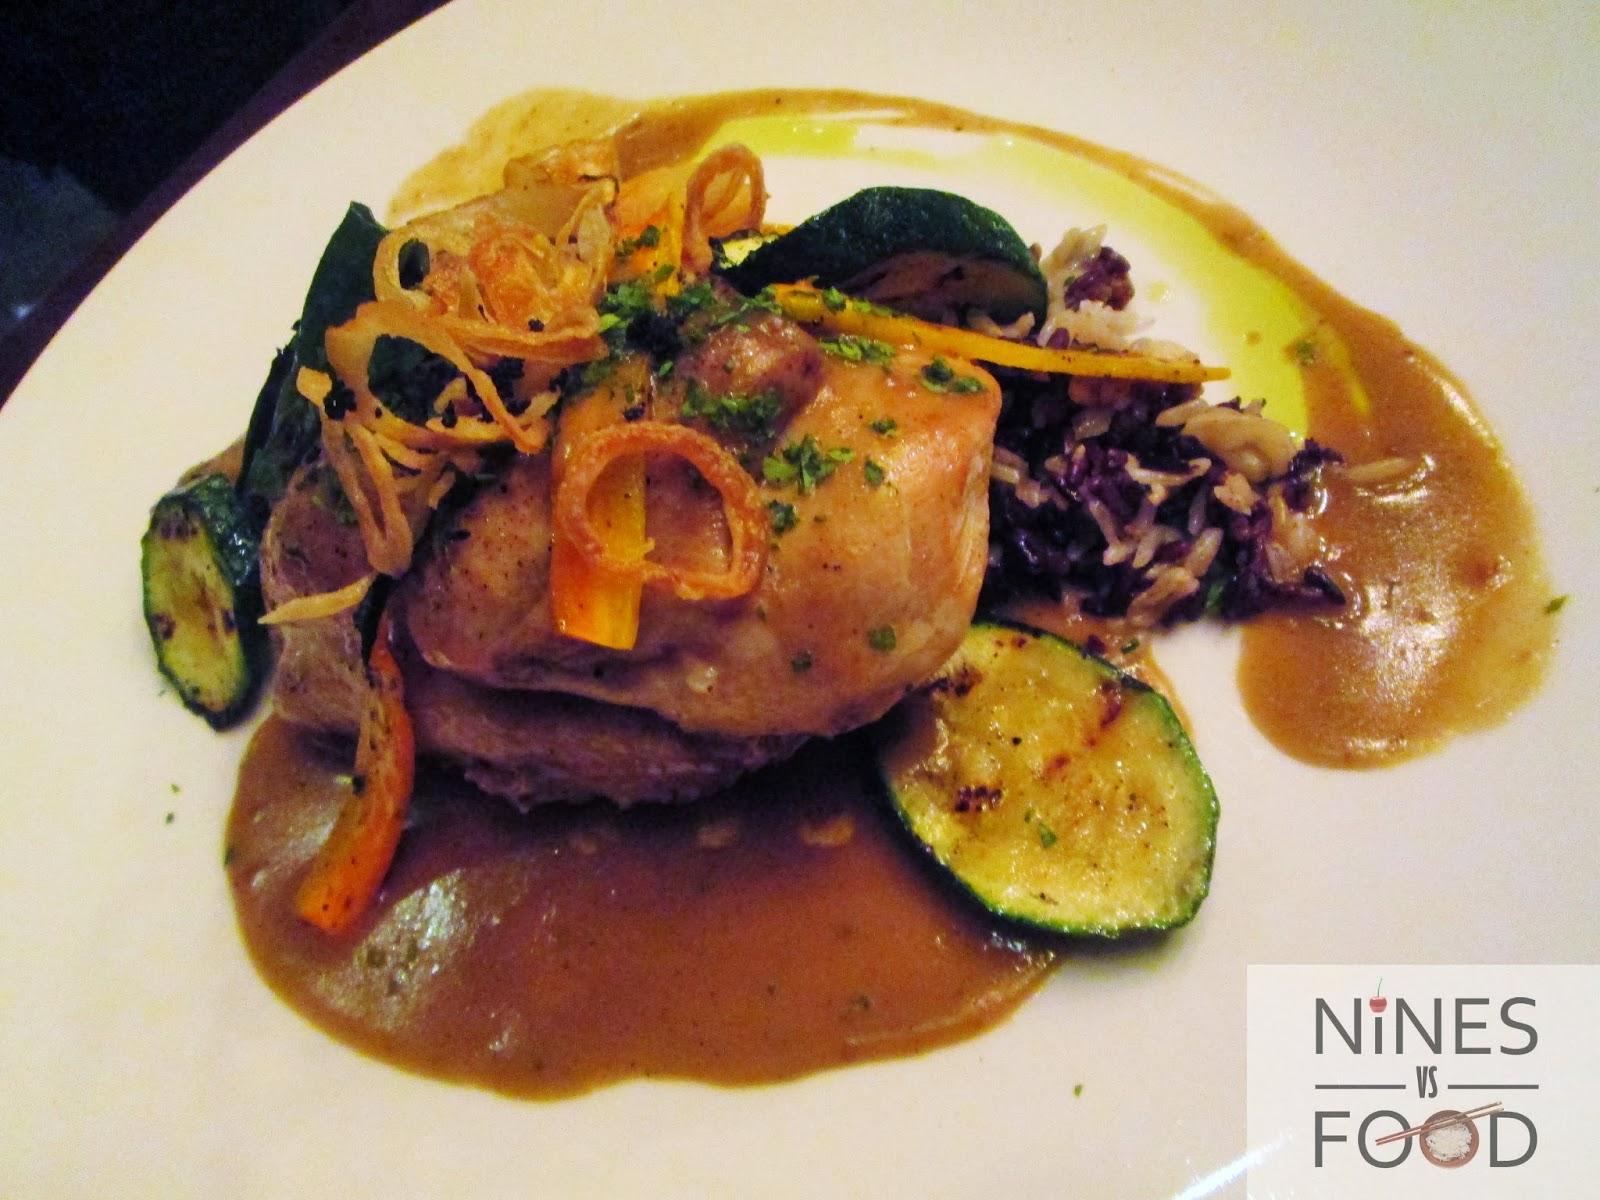 Nines vs. Food - Olive Tree Kitchen and Bar-20.jpg